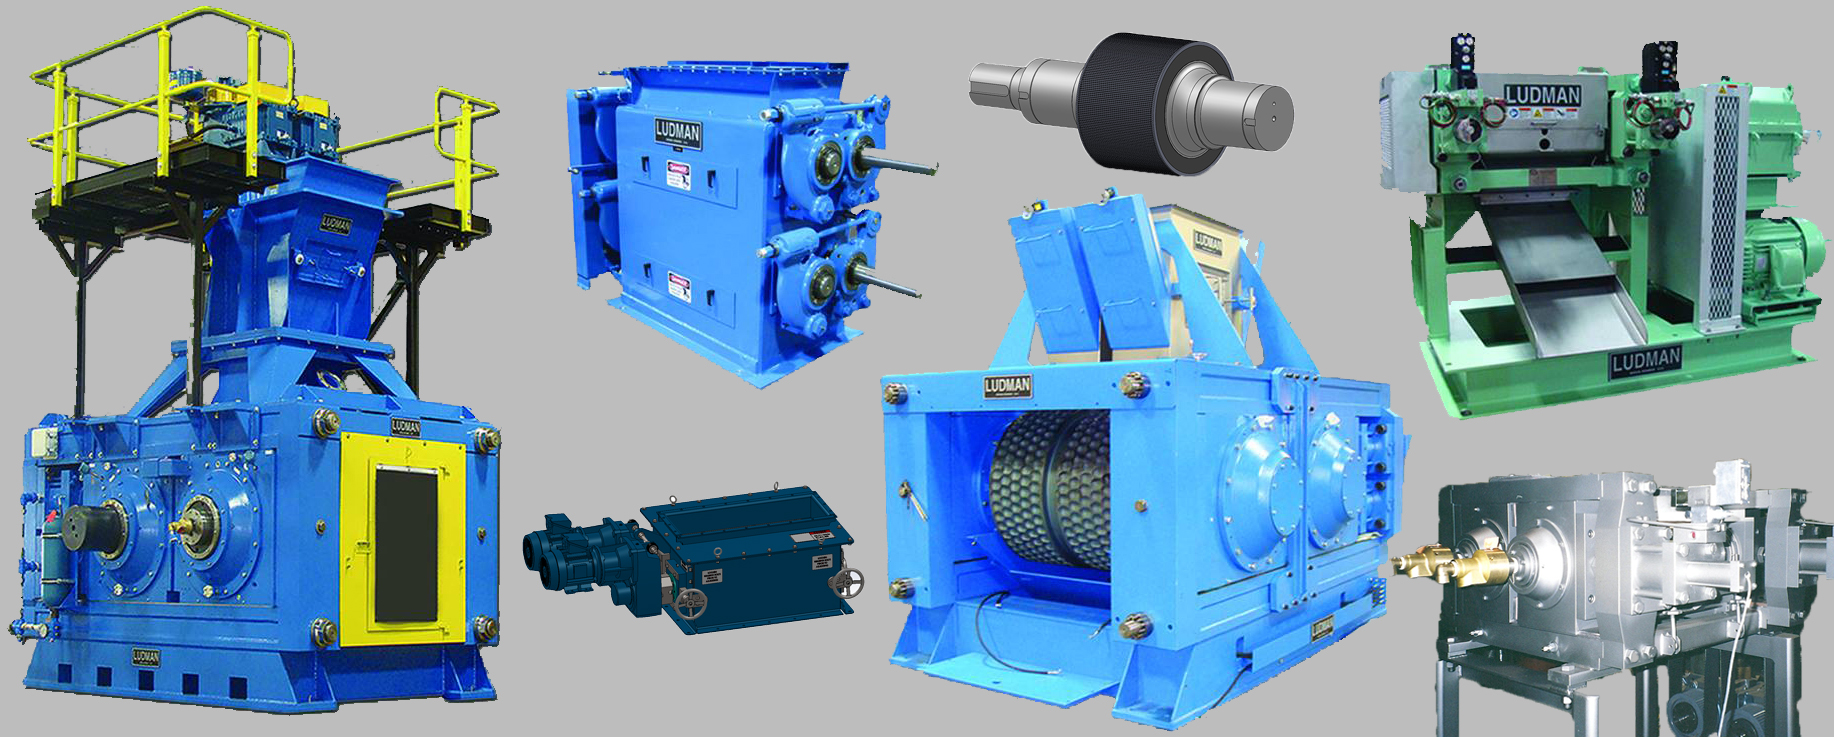 Ludman Industries Machines